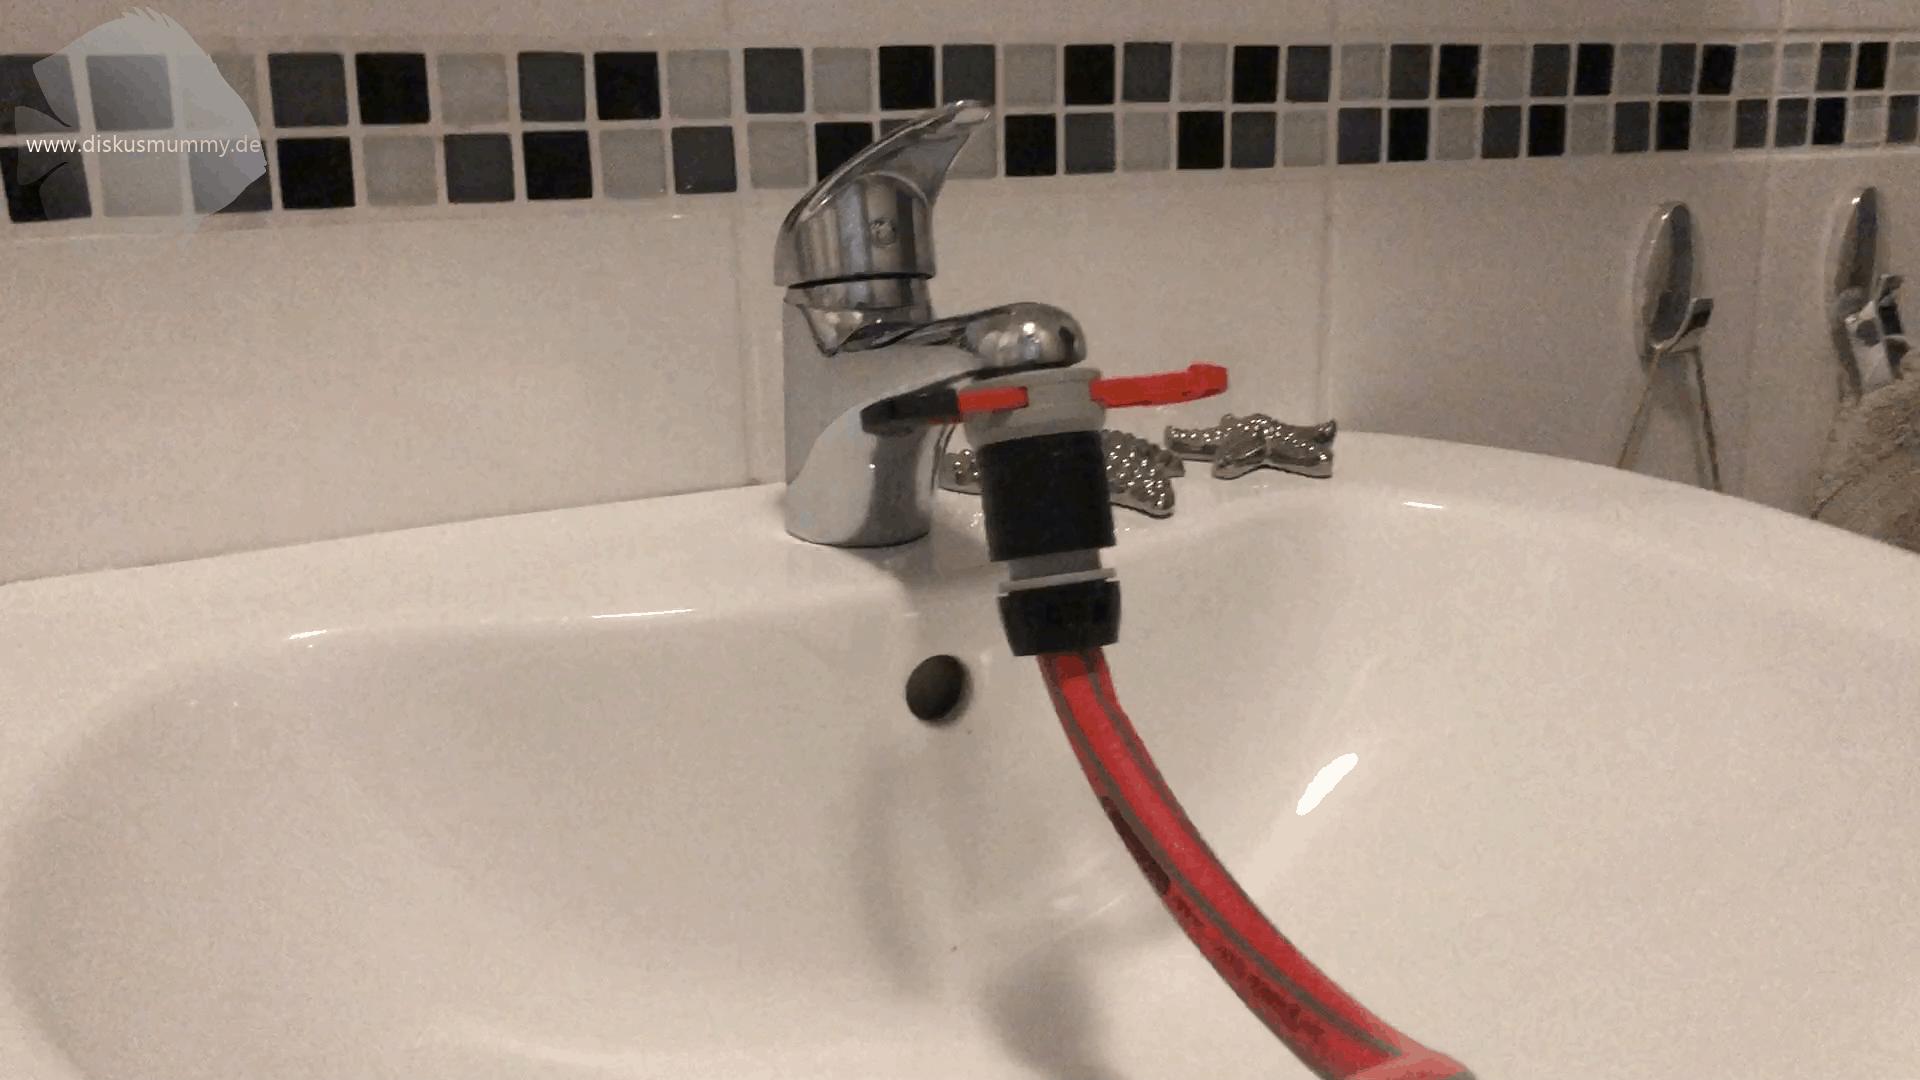 Wasserwechsel einmal anders! 5